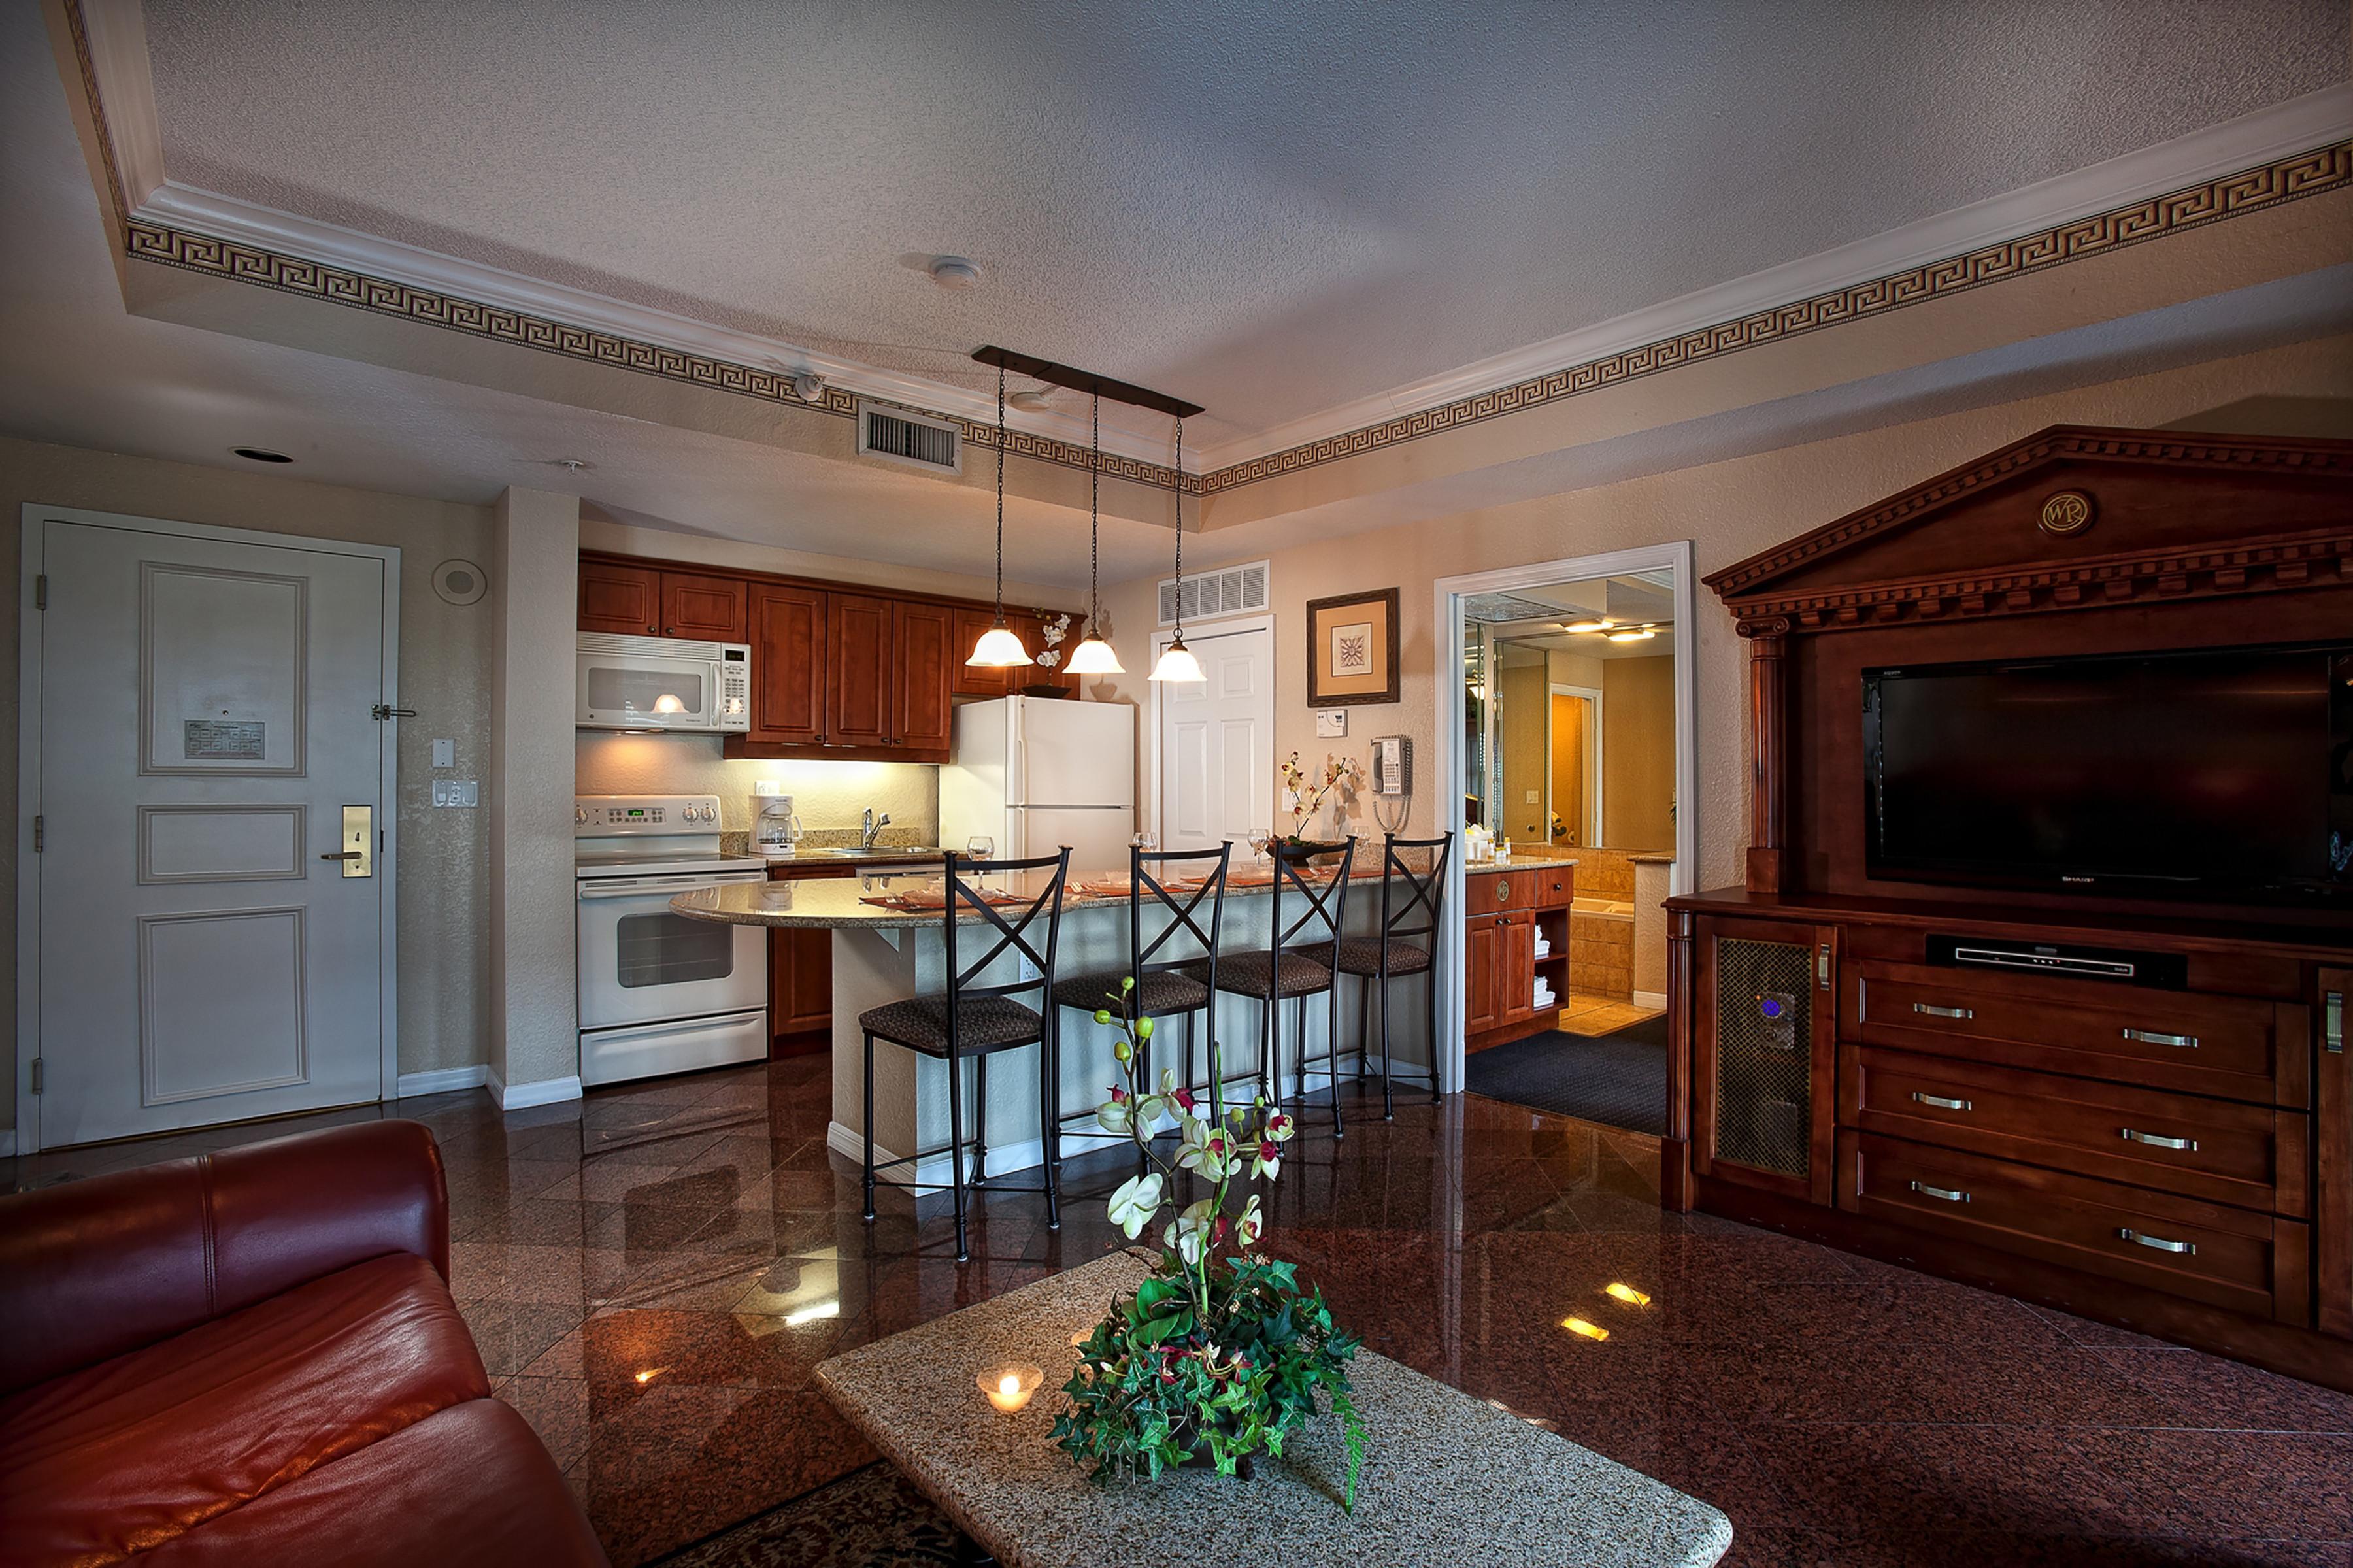 Westgate Palace Resort Photos Of Hotels In Orlando Florida